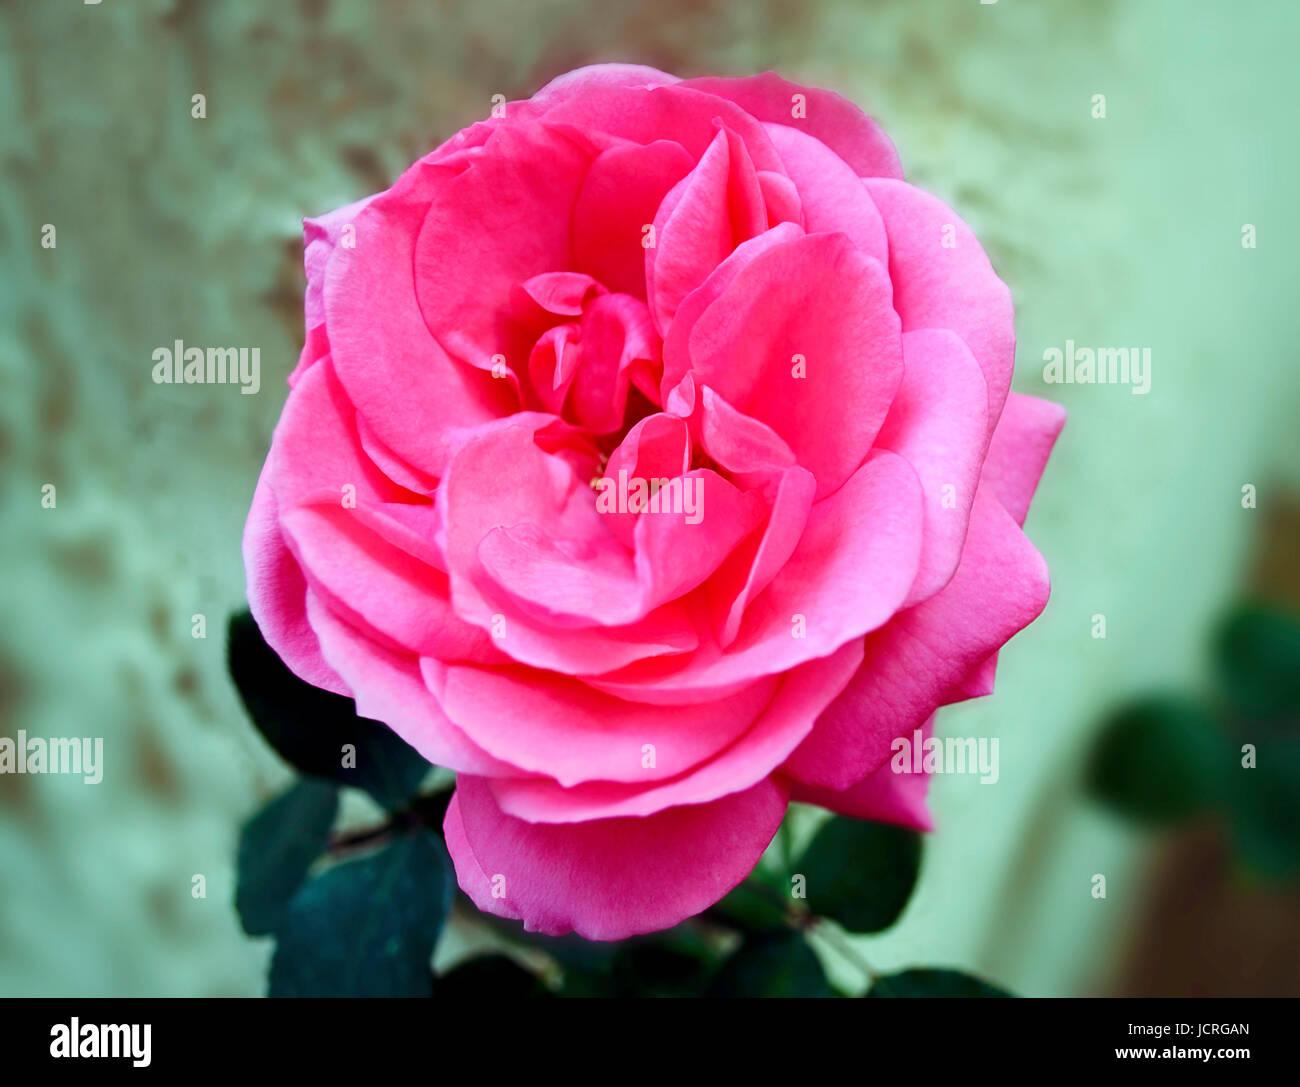 Blooming pink rose with big petals spring flowers greek botanic blooming pink rose with big petals spring flowers greek botanic garden mightylinksfo